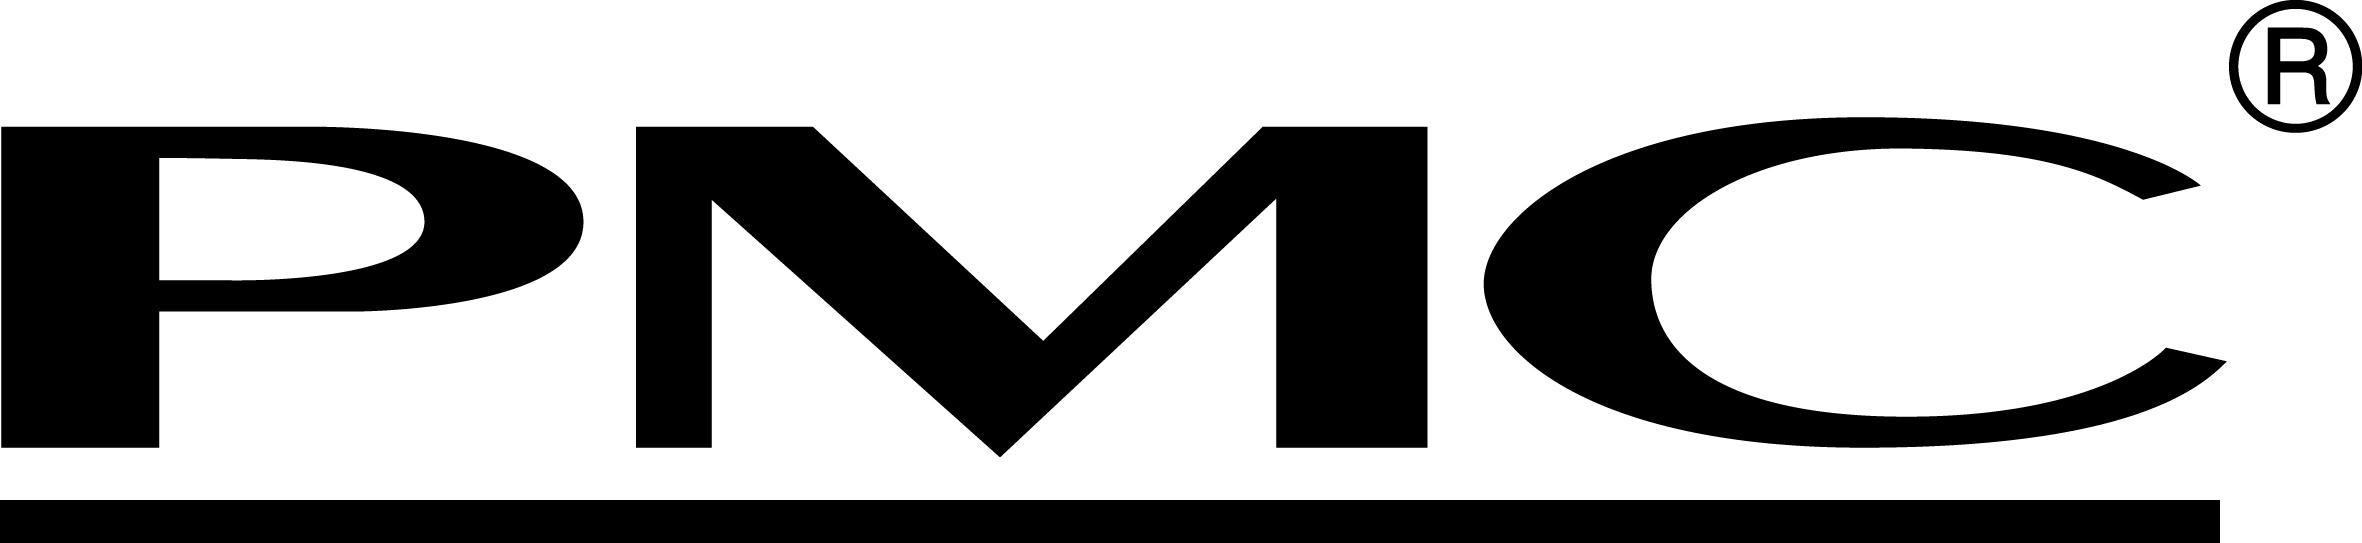 pmc-logo-no-dots.jpg